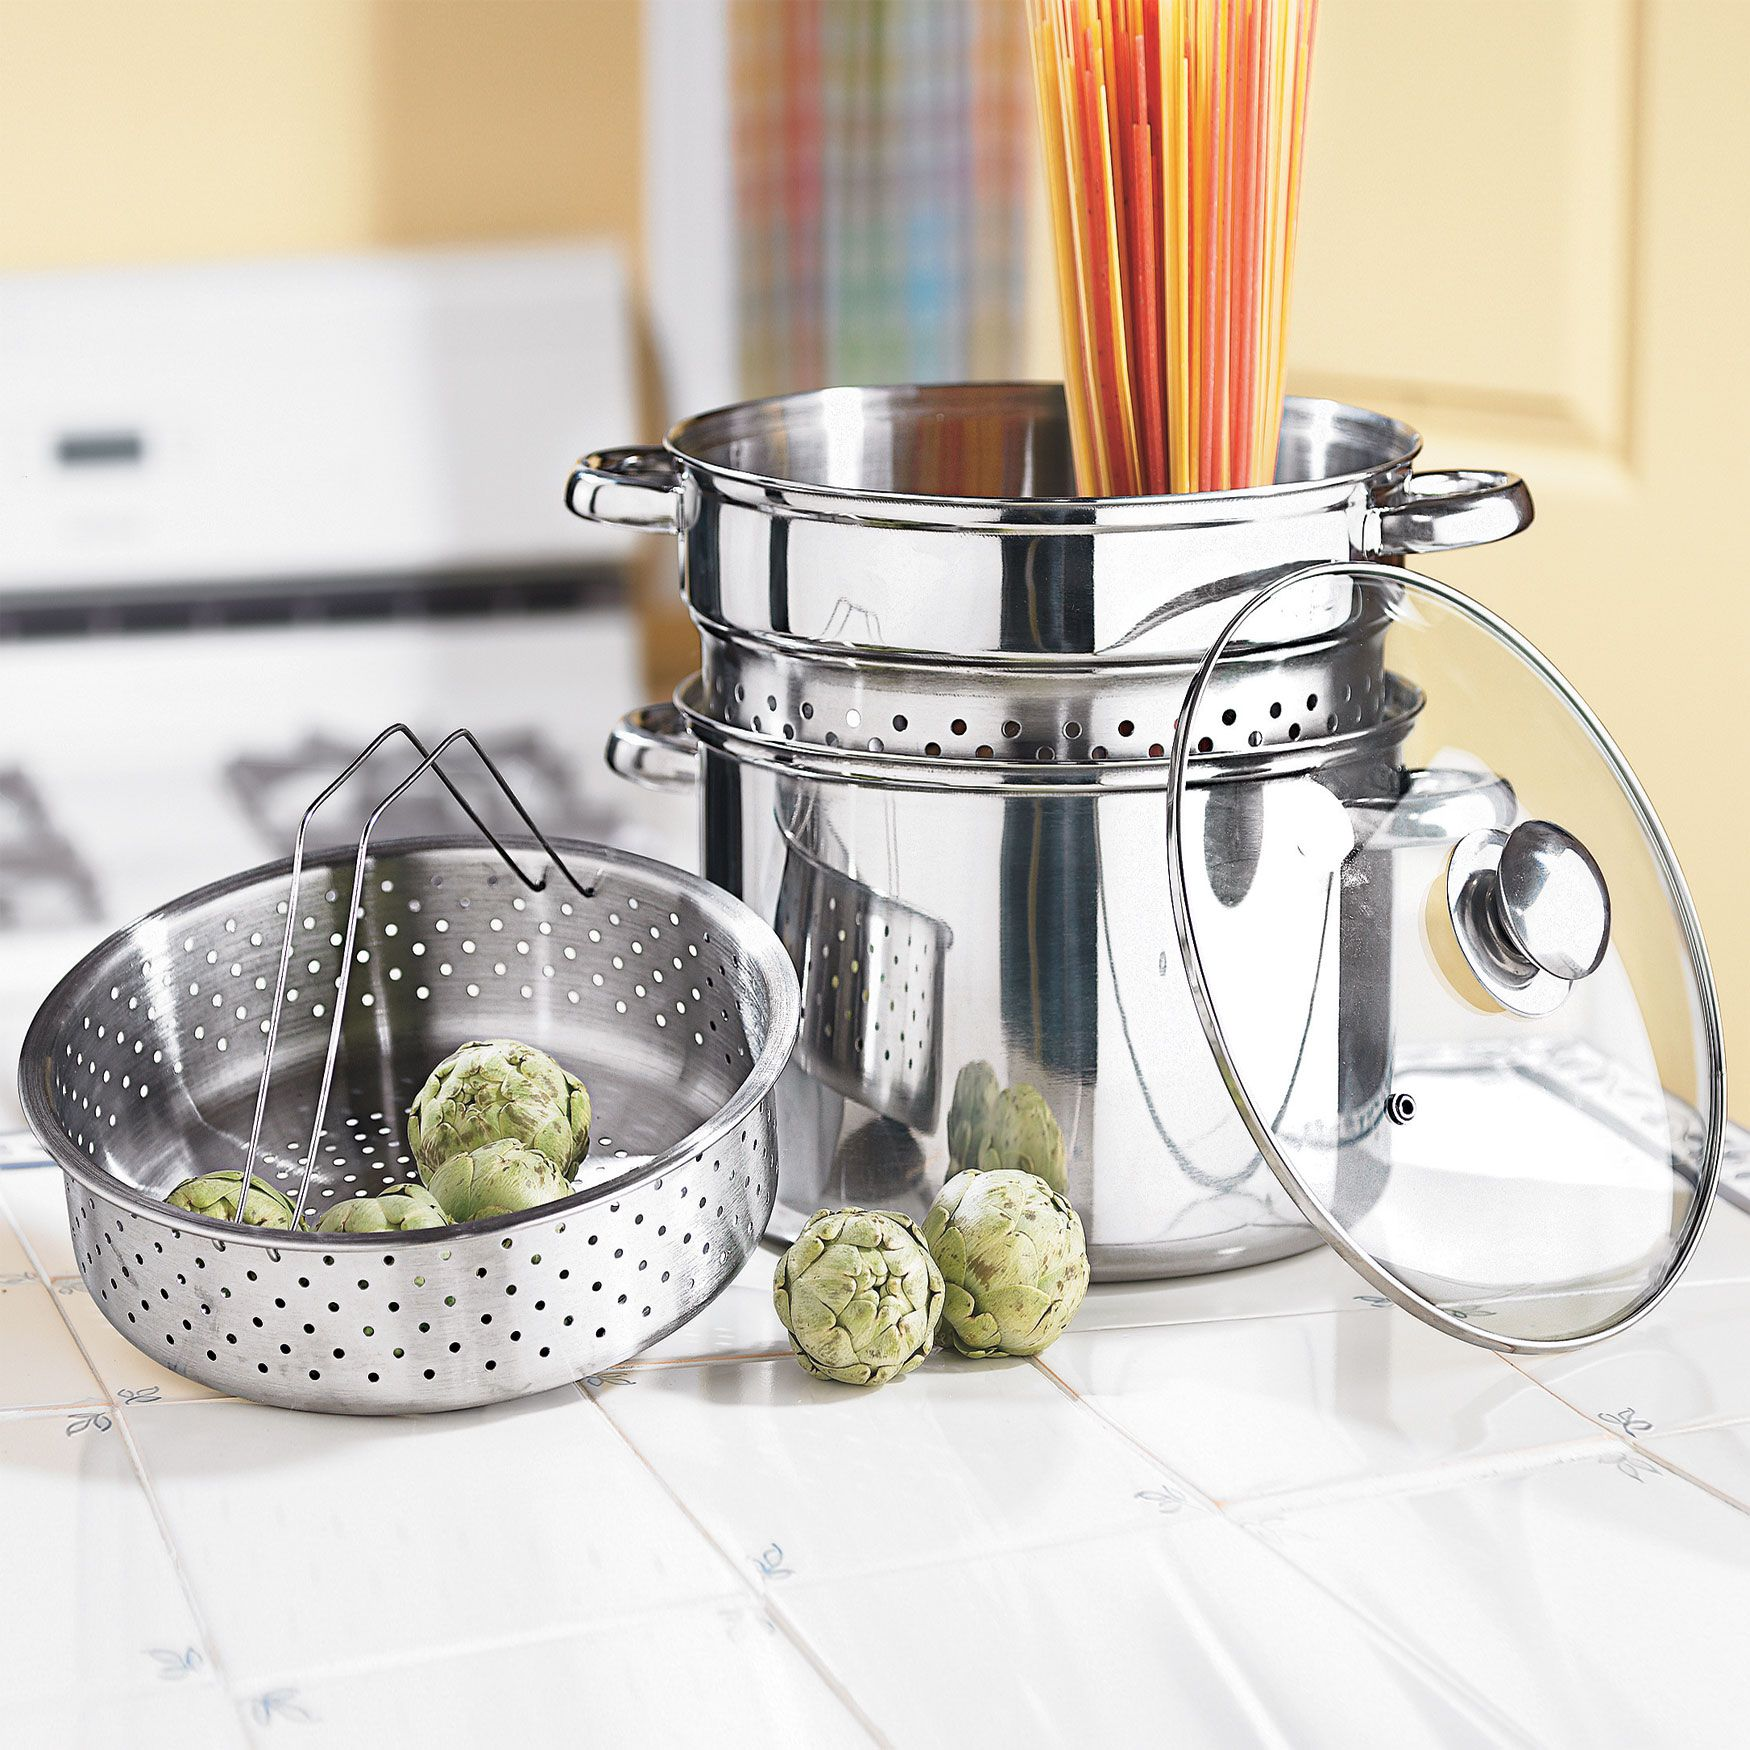 Versatile 4IN1 Stainless Steel Pot Stainless steel pot